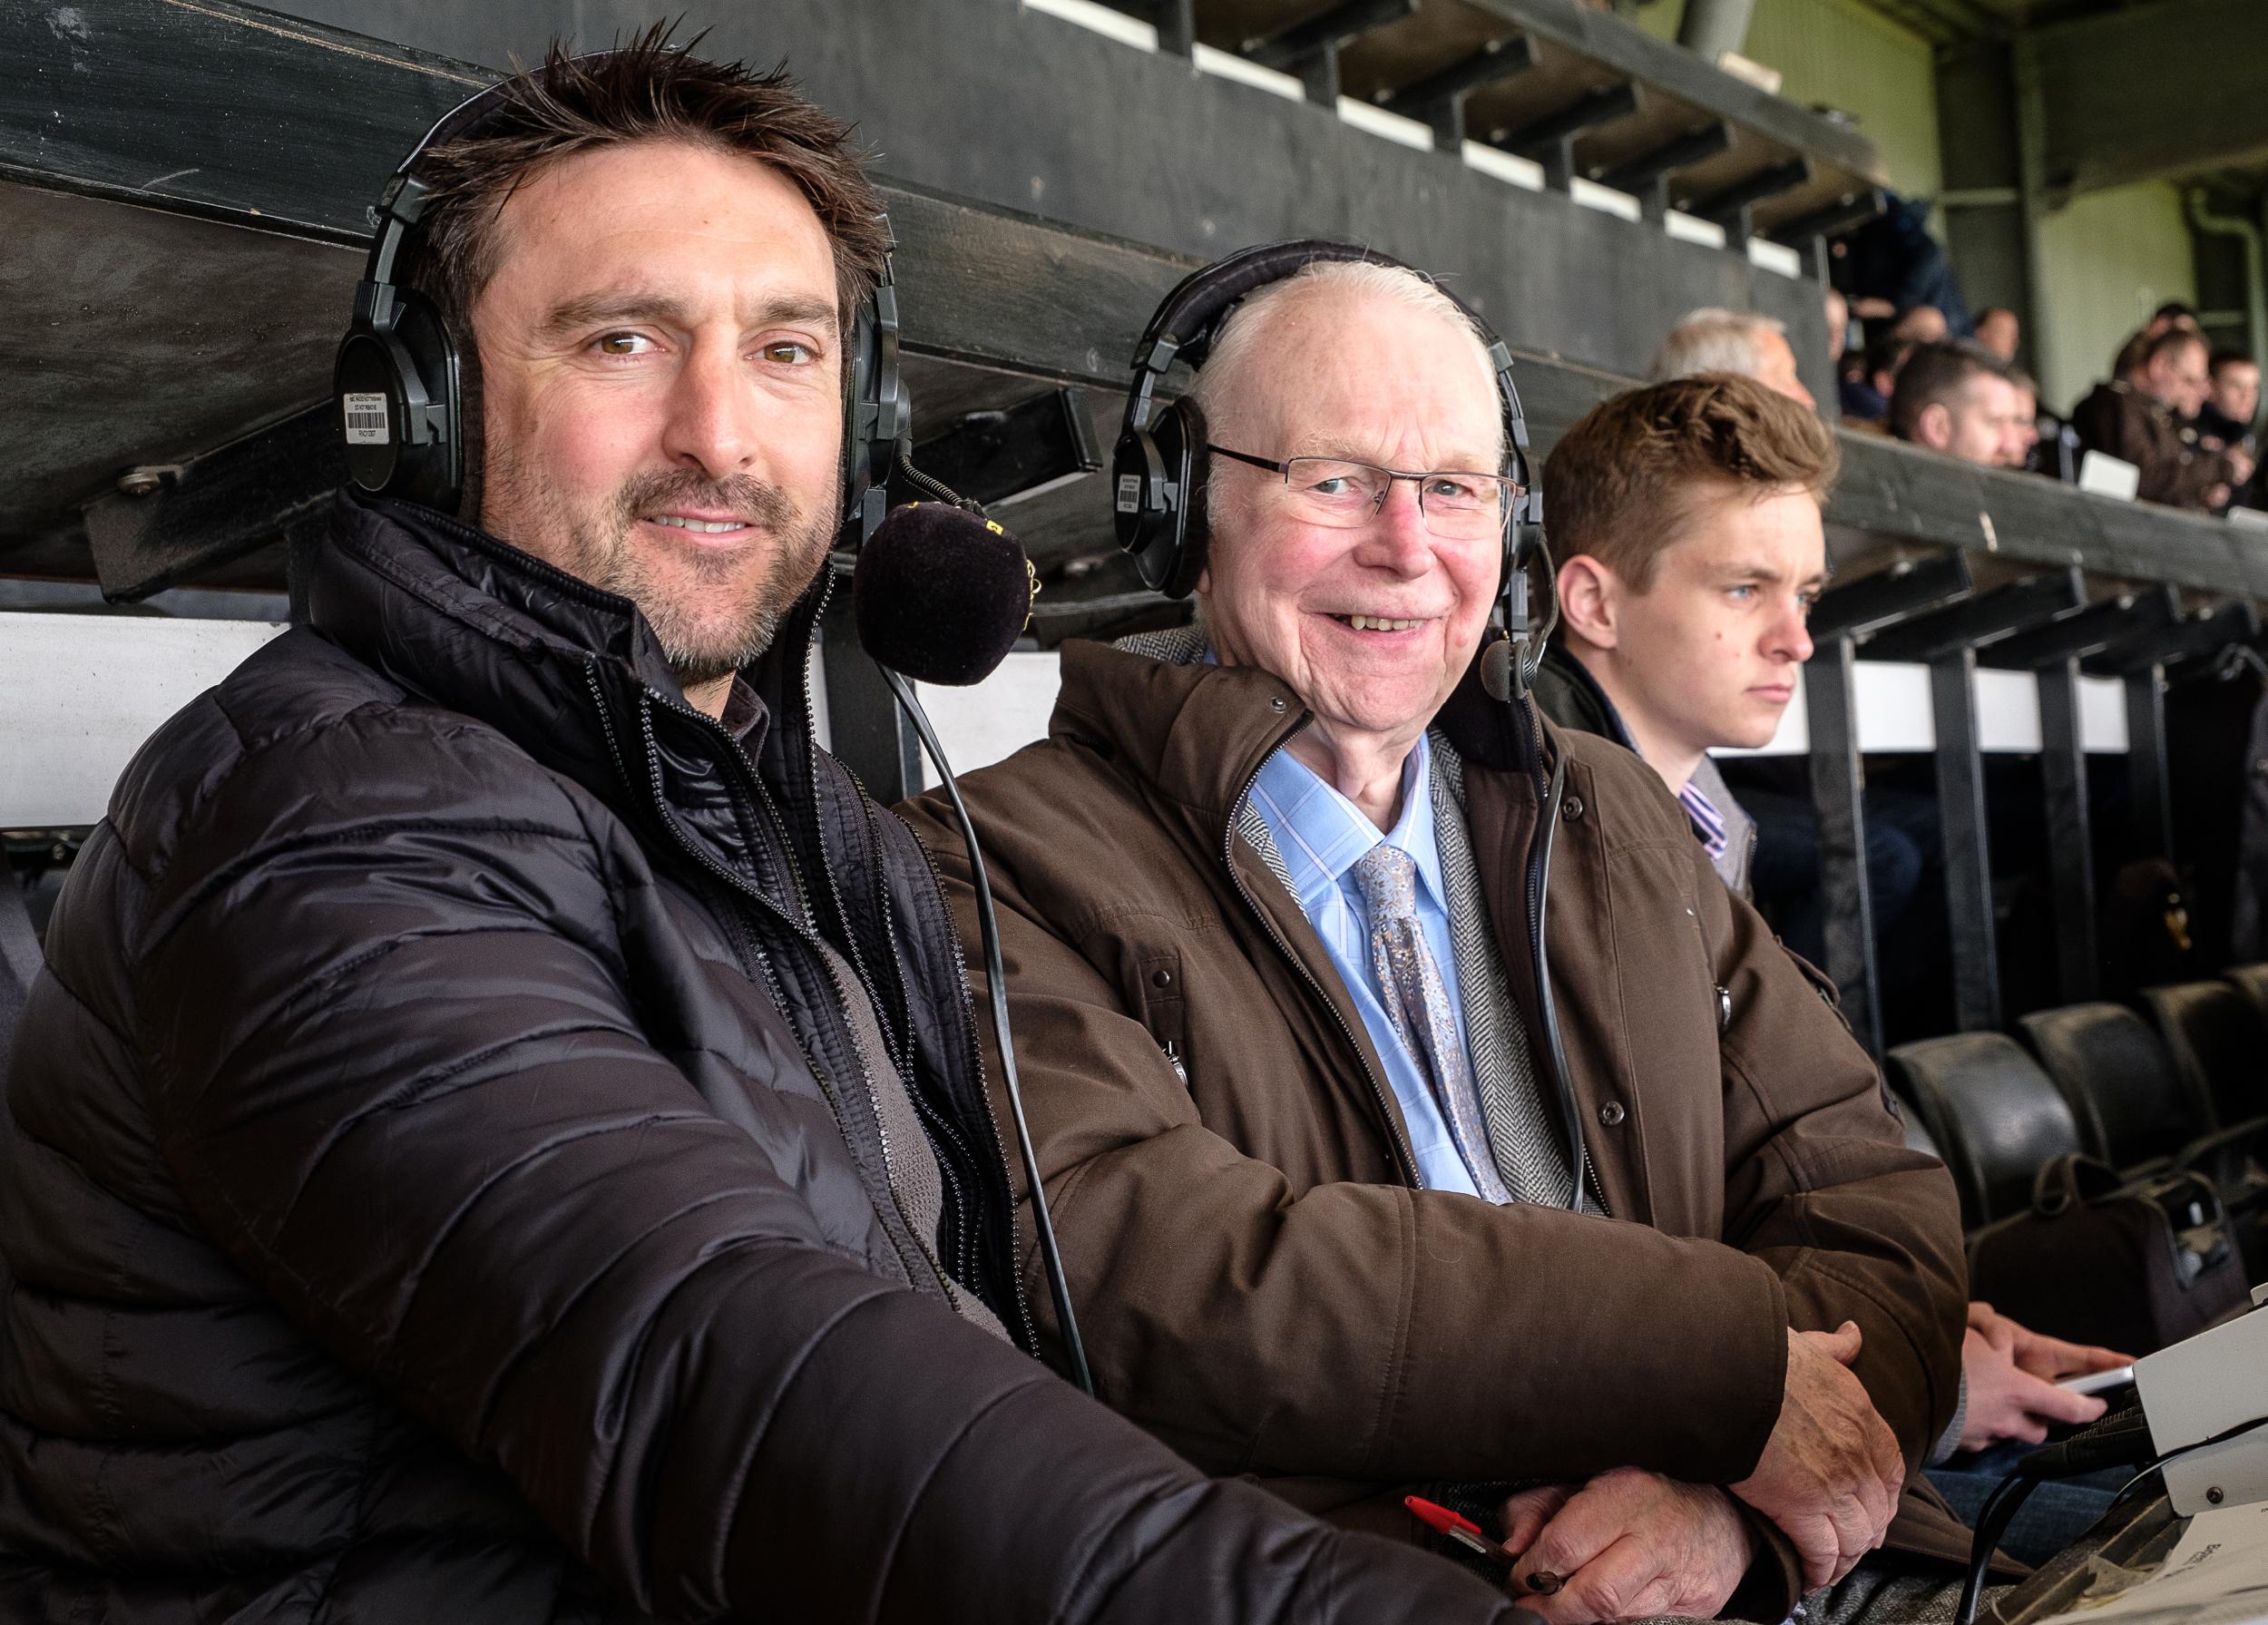 Colin Slater pictured with ex Notts striker and summariser Mark Stallard